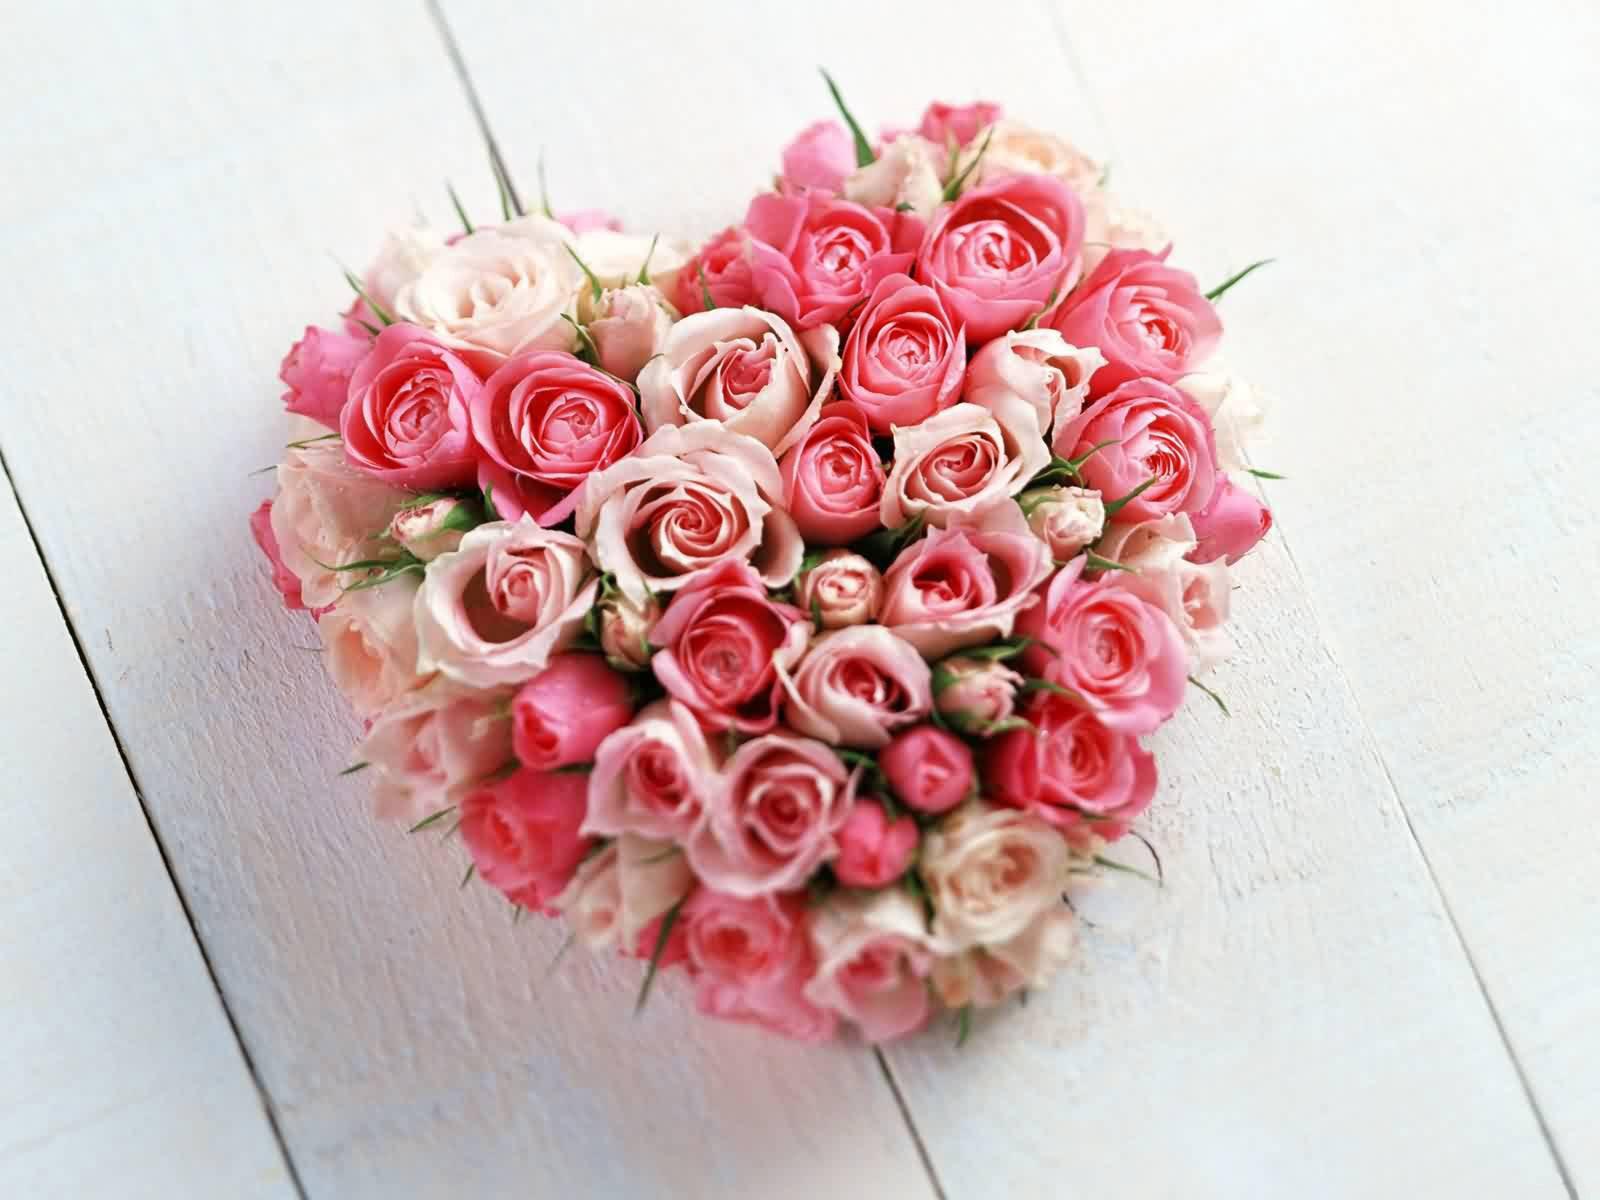 The Best Top Desktop Roses Wallpapers Hd Rose Wallpaper 13 Heart Of Pink